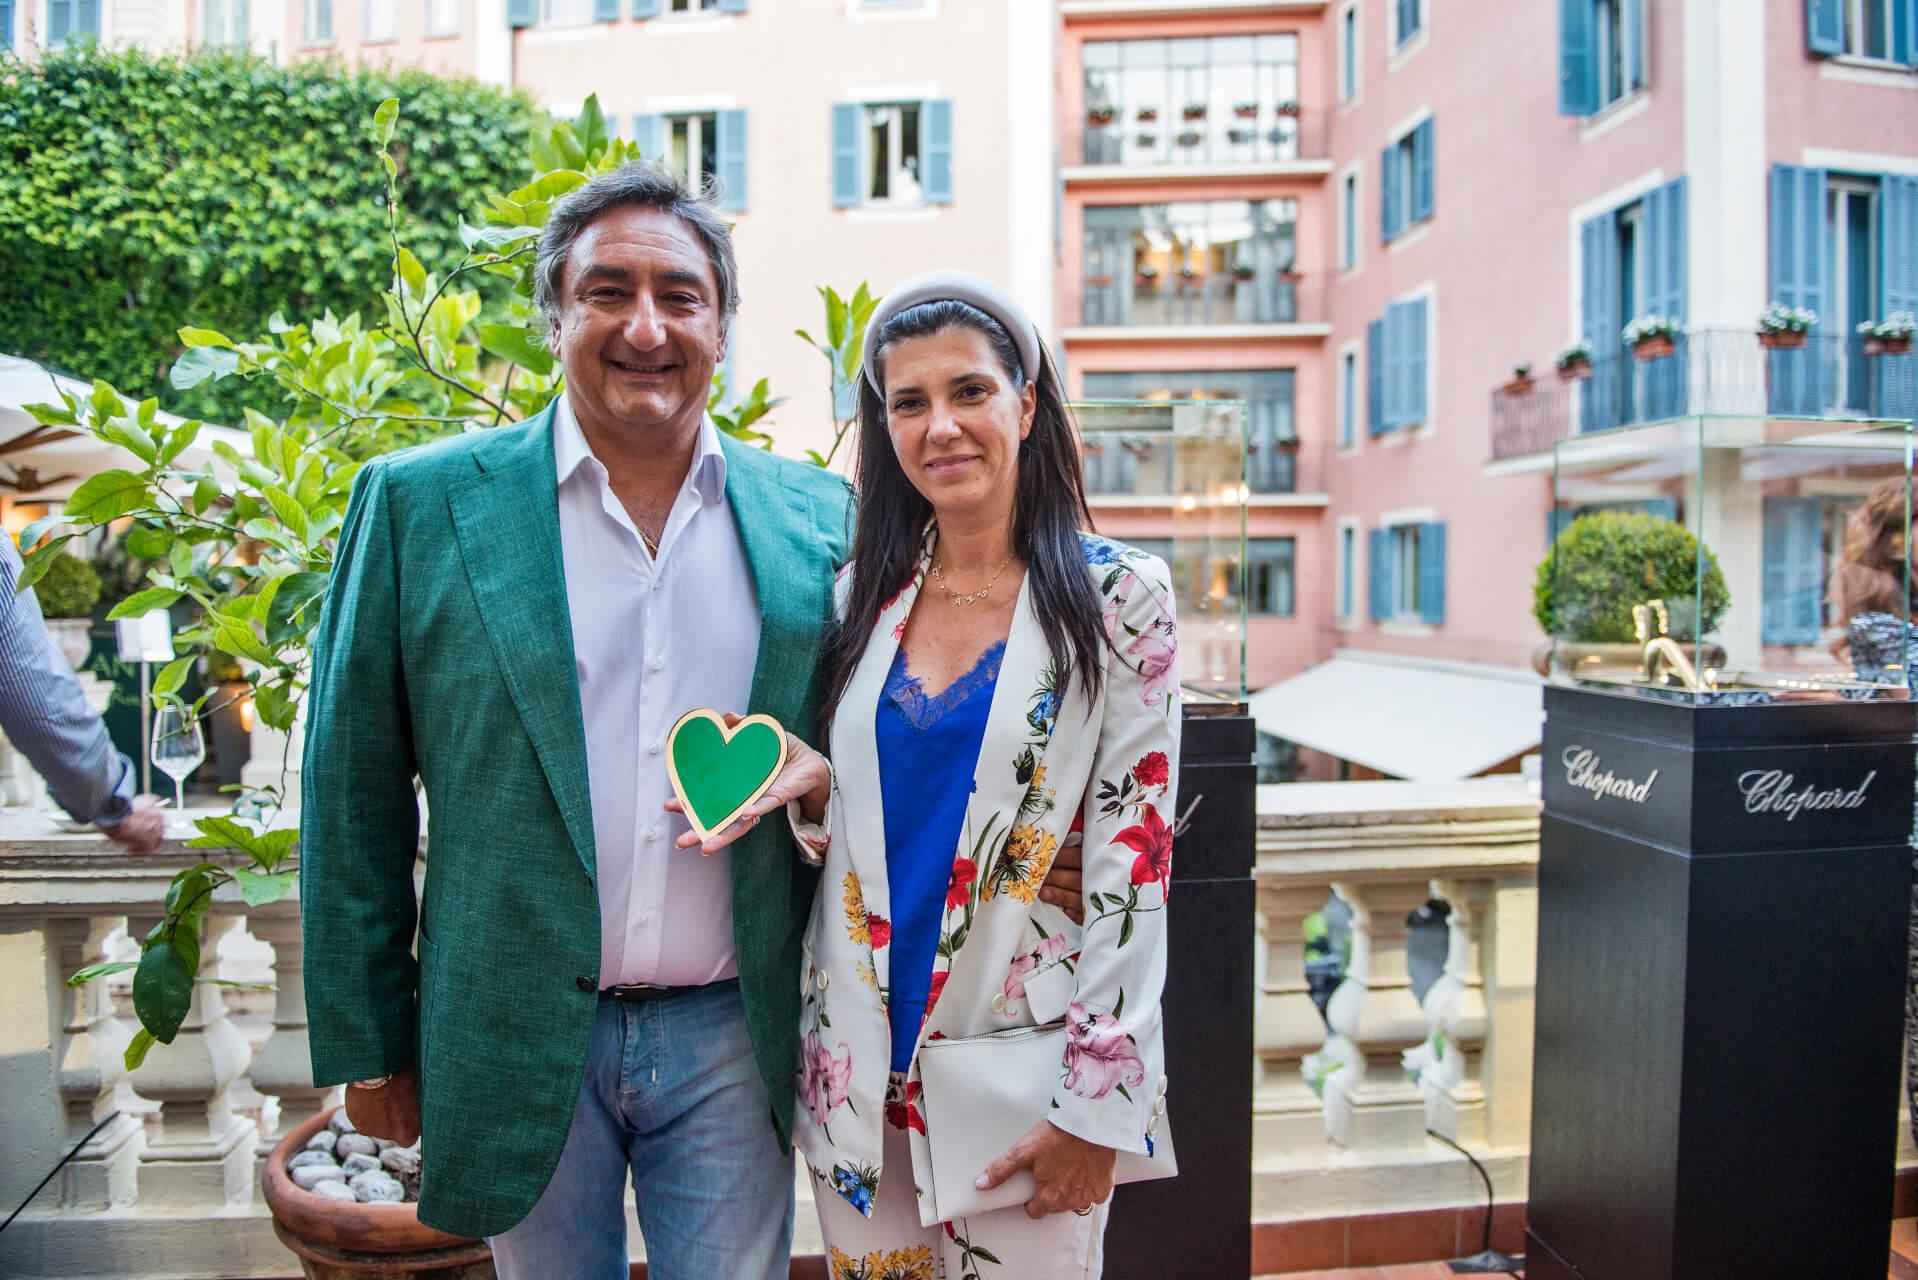 Paolo and Francesca Spatano